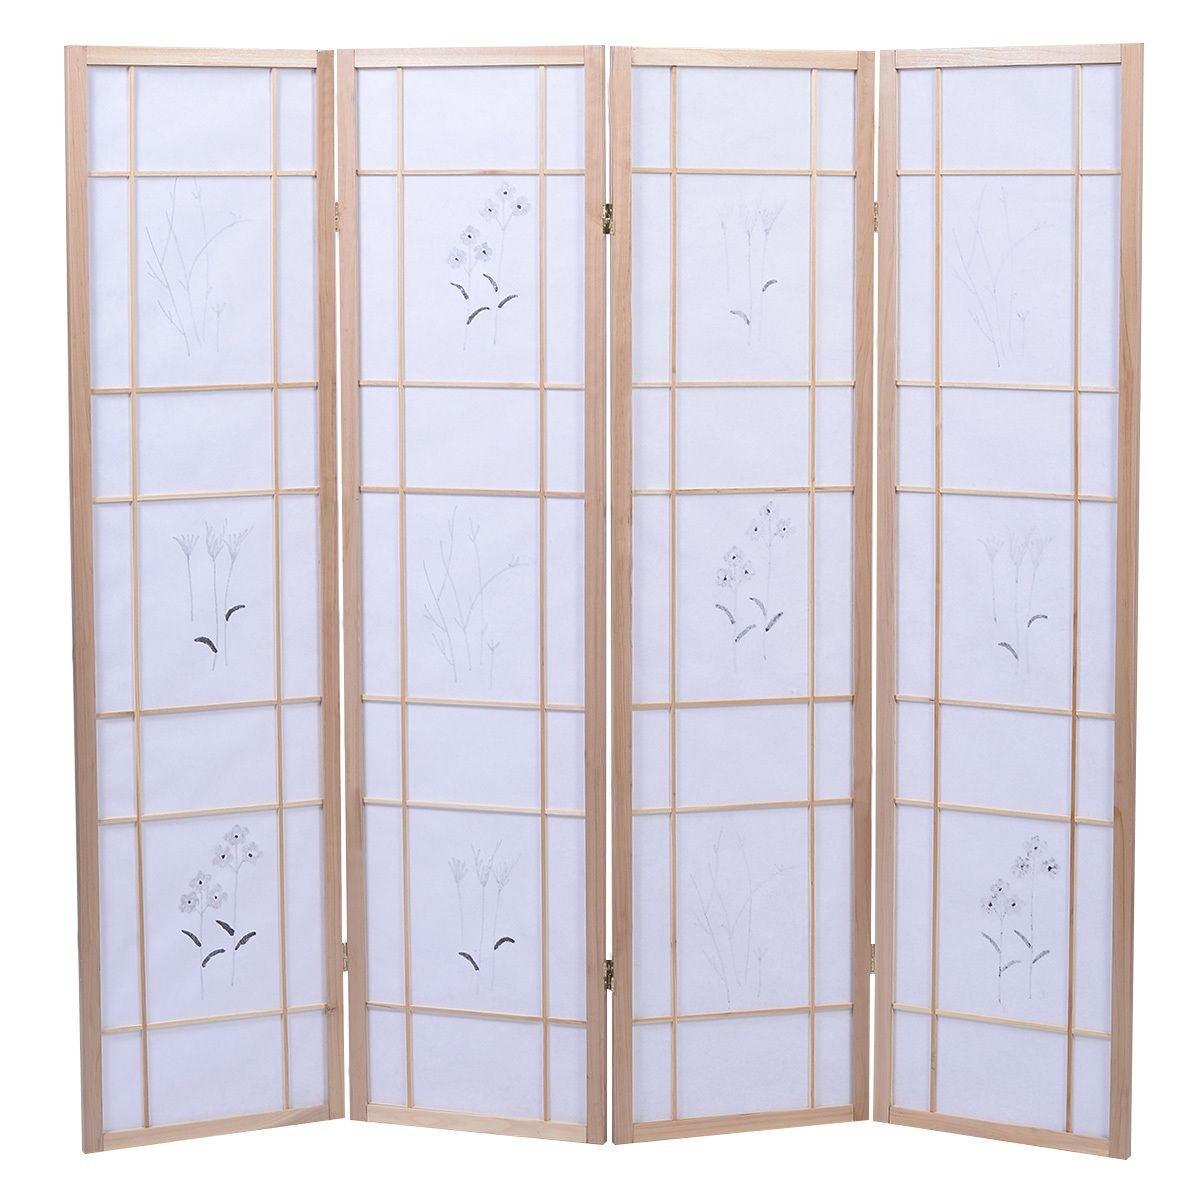 Alitop 4 Panel Flowered Room Divider Screen Style Shoji Solid Wood Natrual